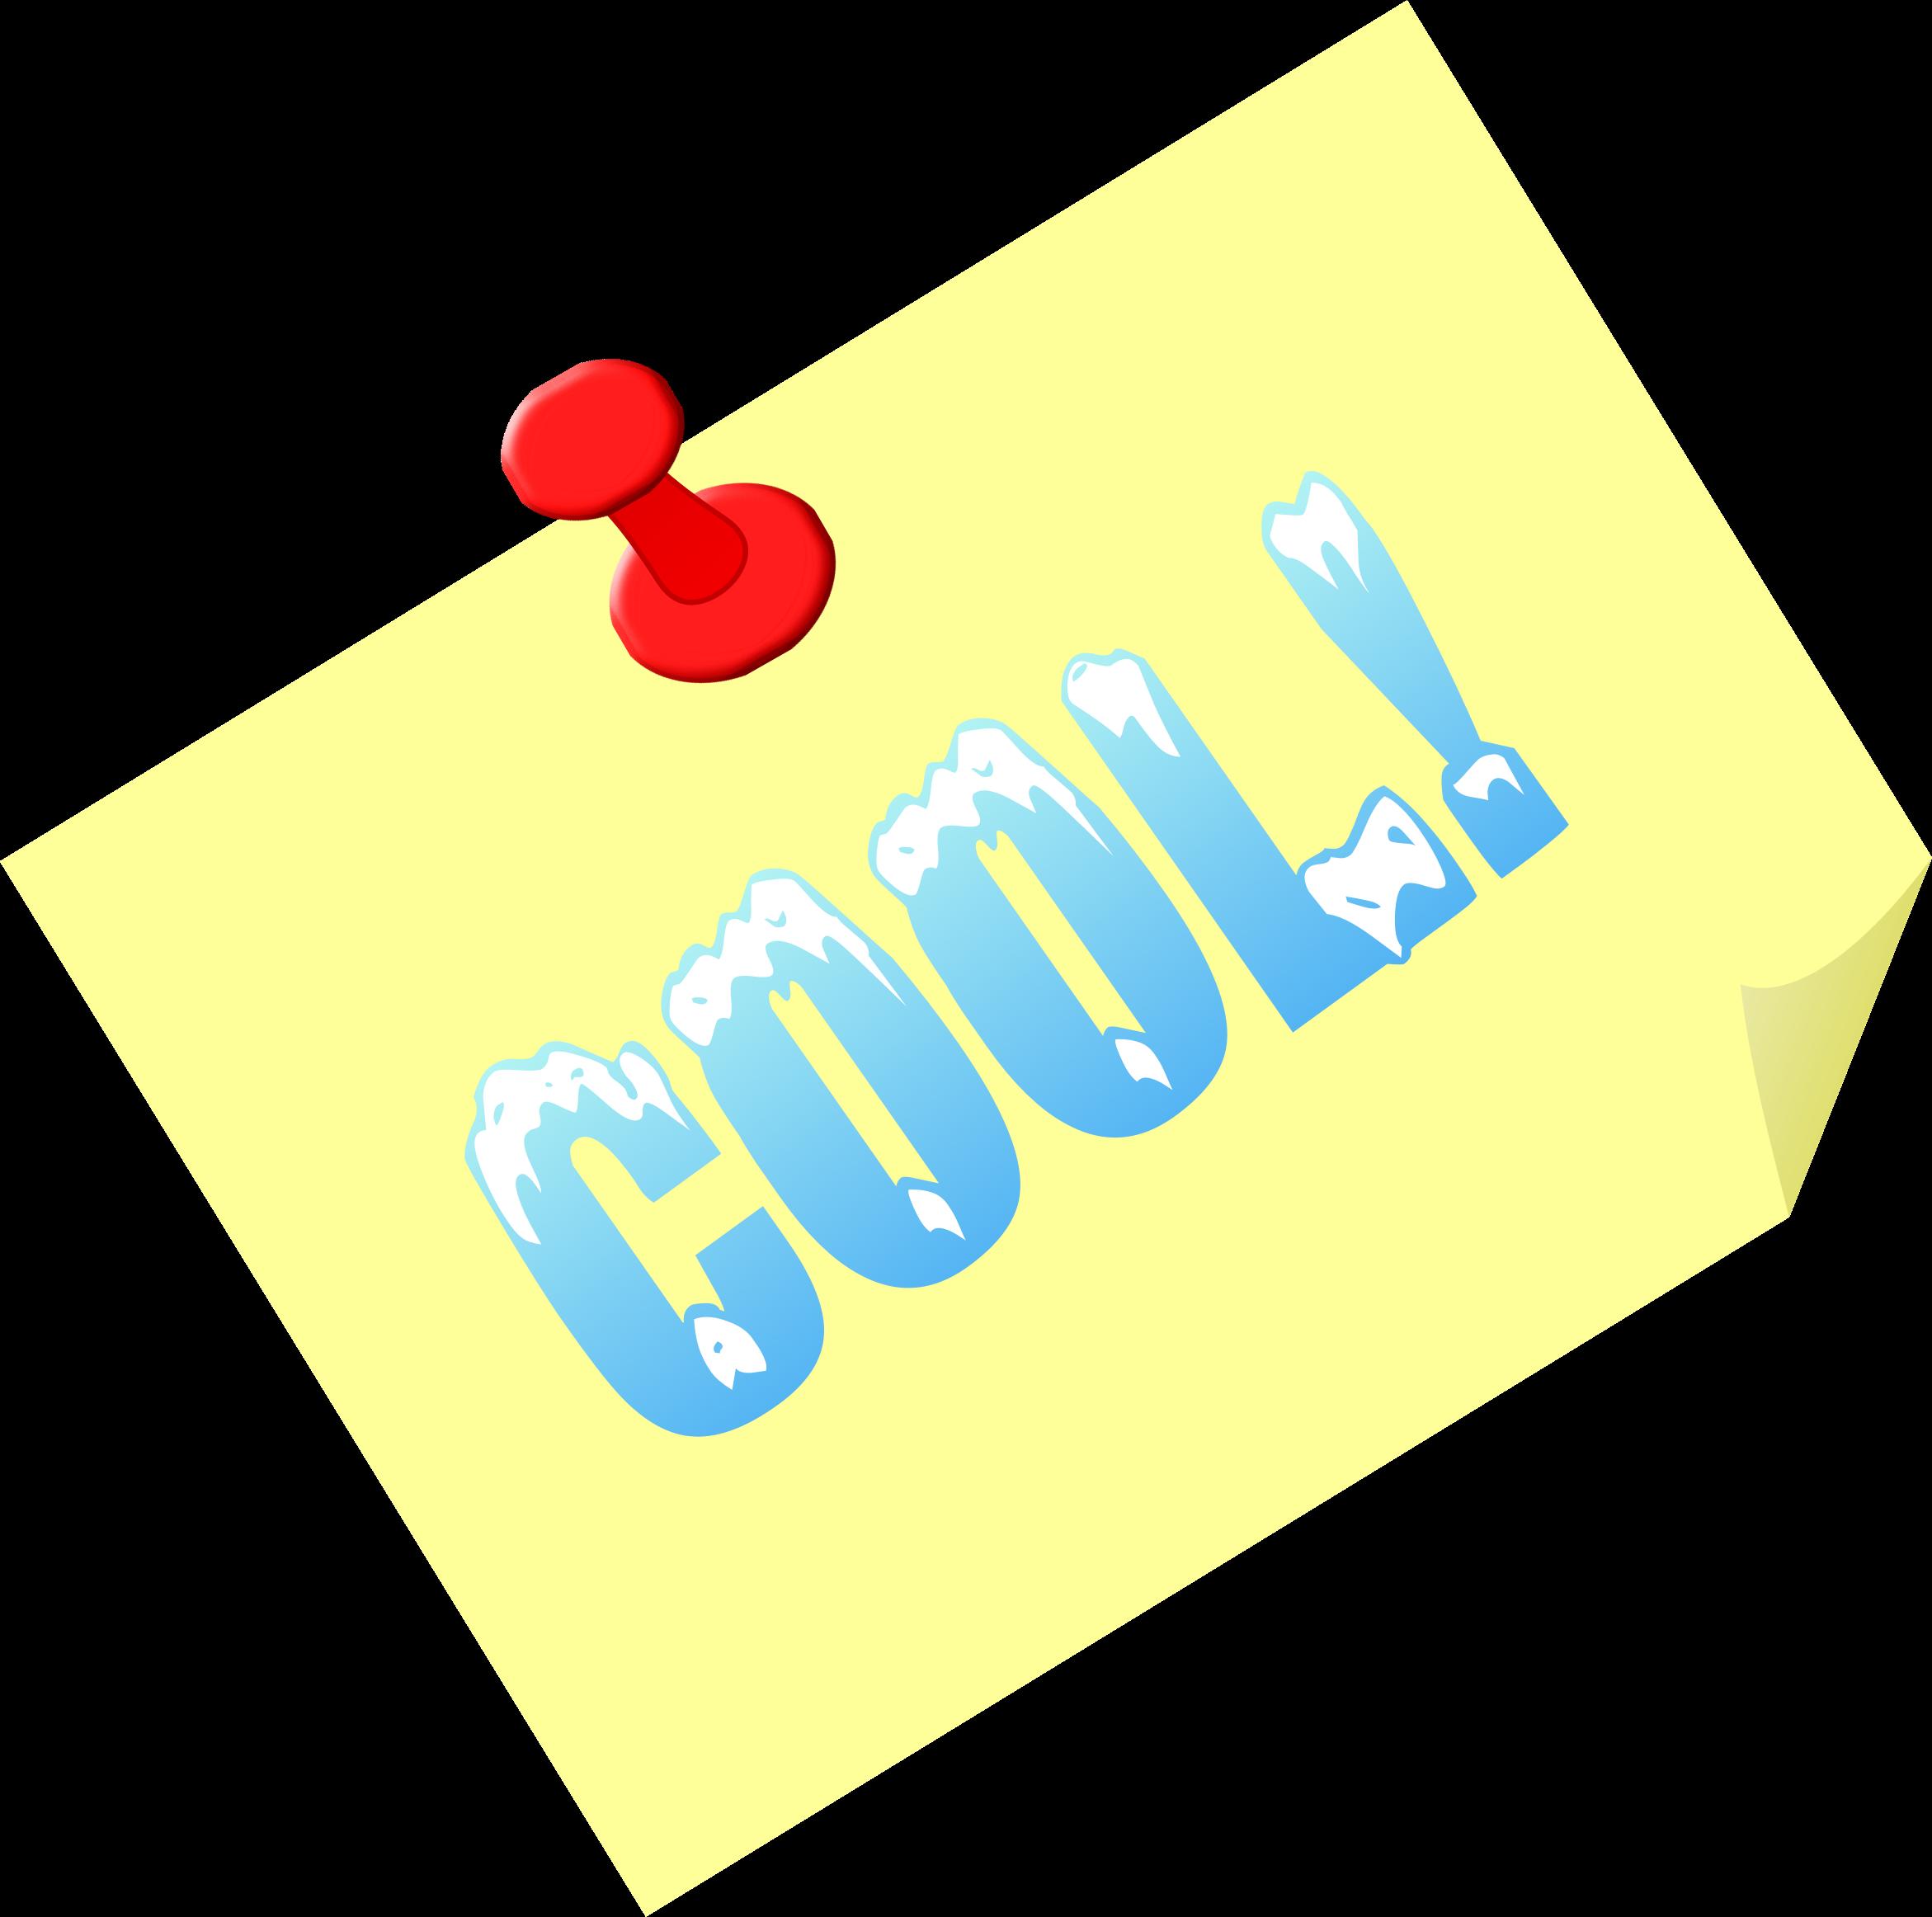 Cool clipart logo. Big image png